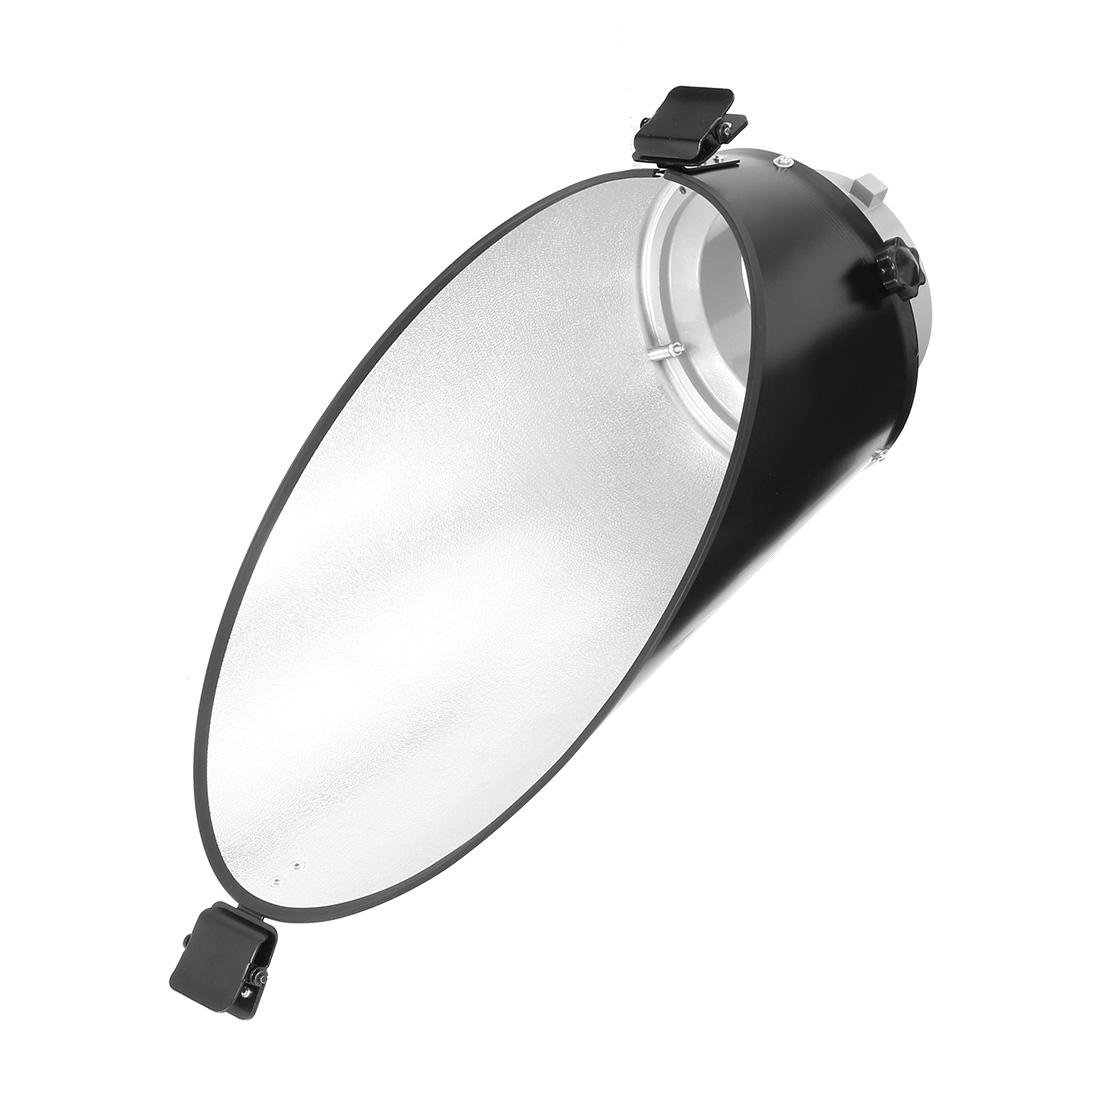 Oblique Reflector Diffuser Dish Lamp Shade for Studio Light Fade-away